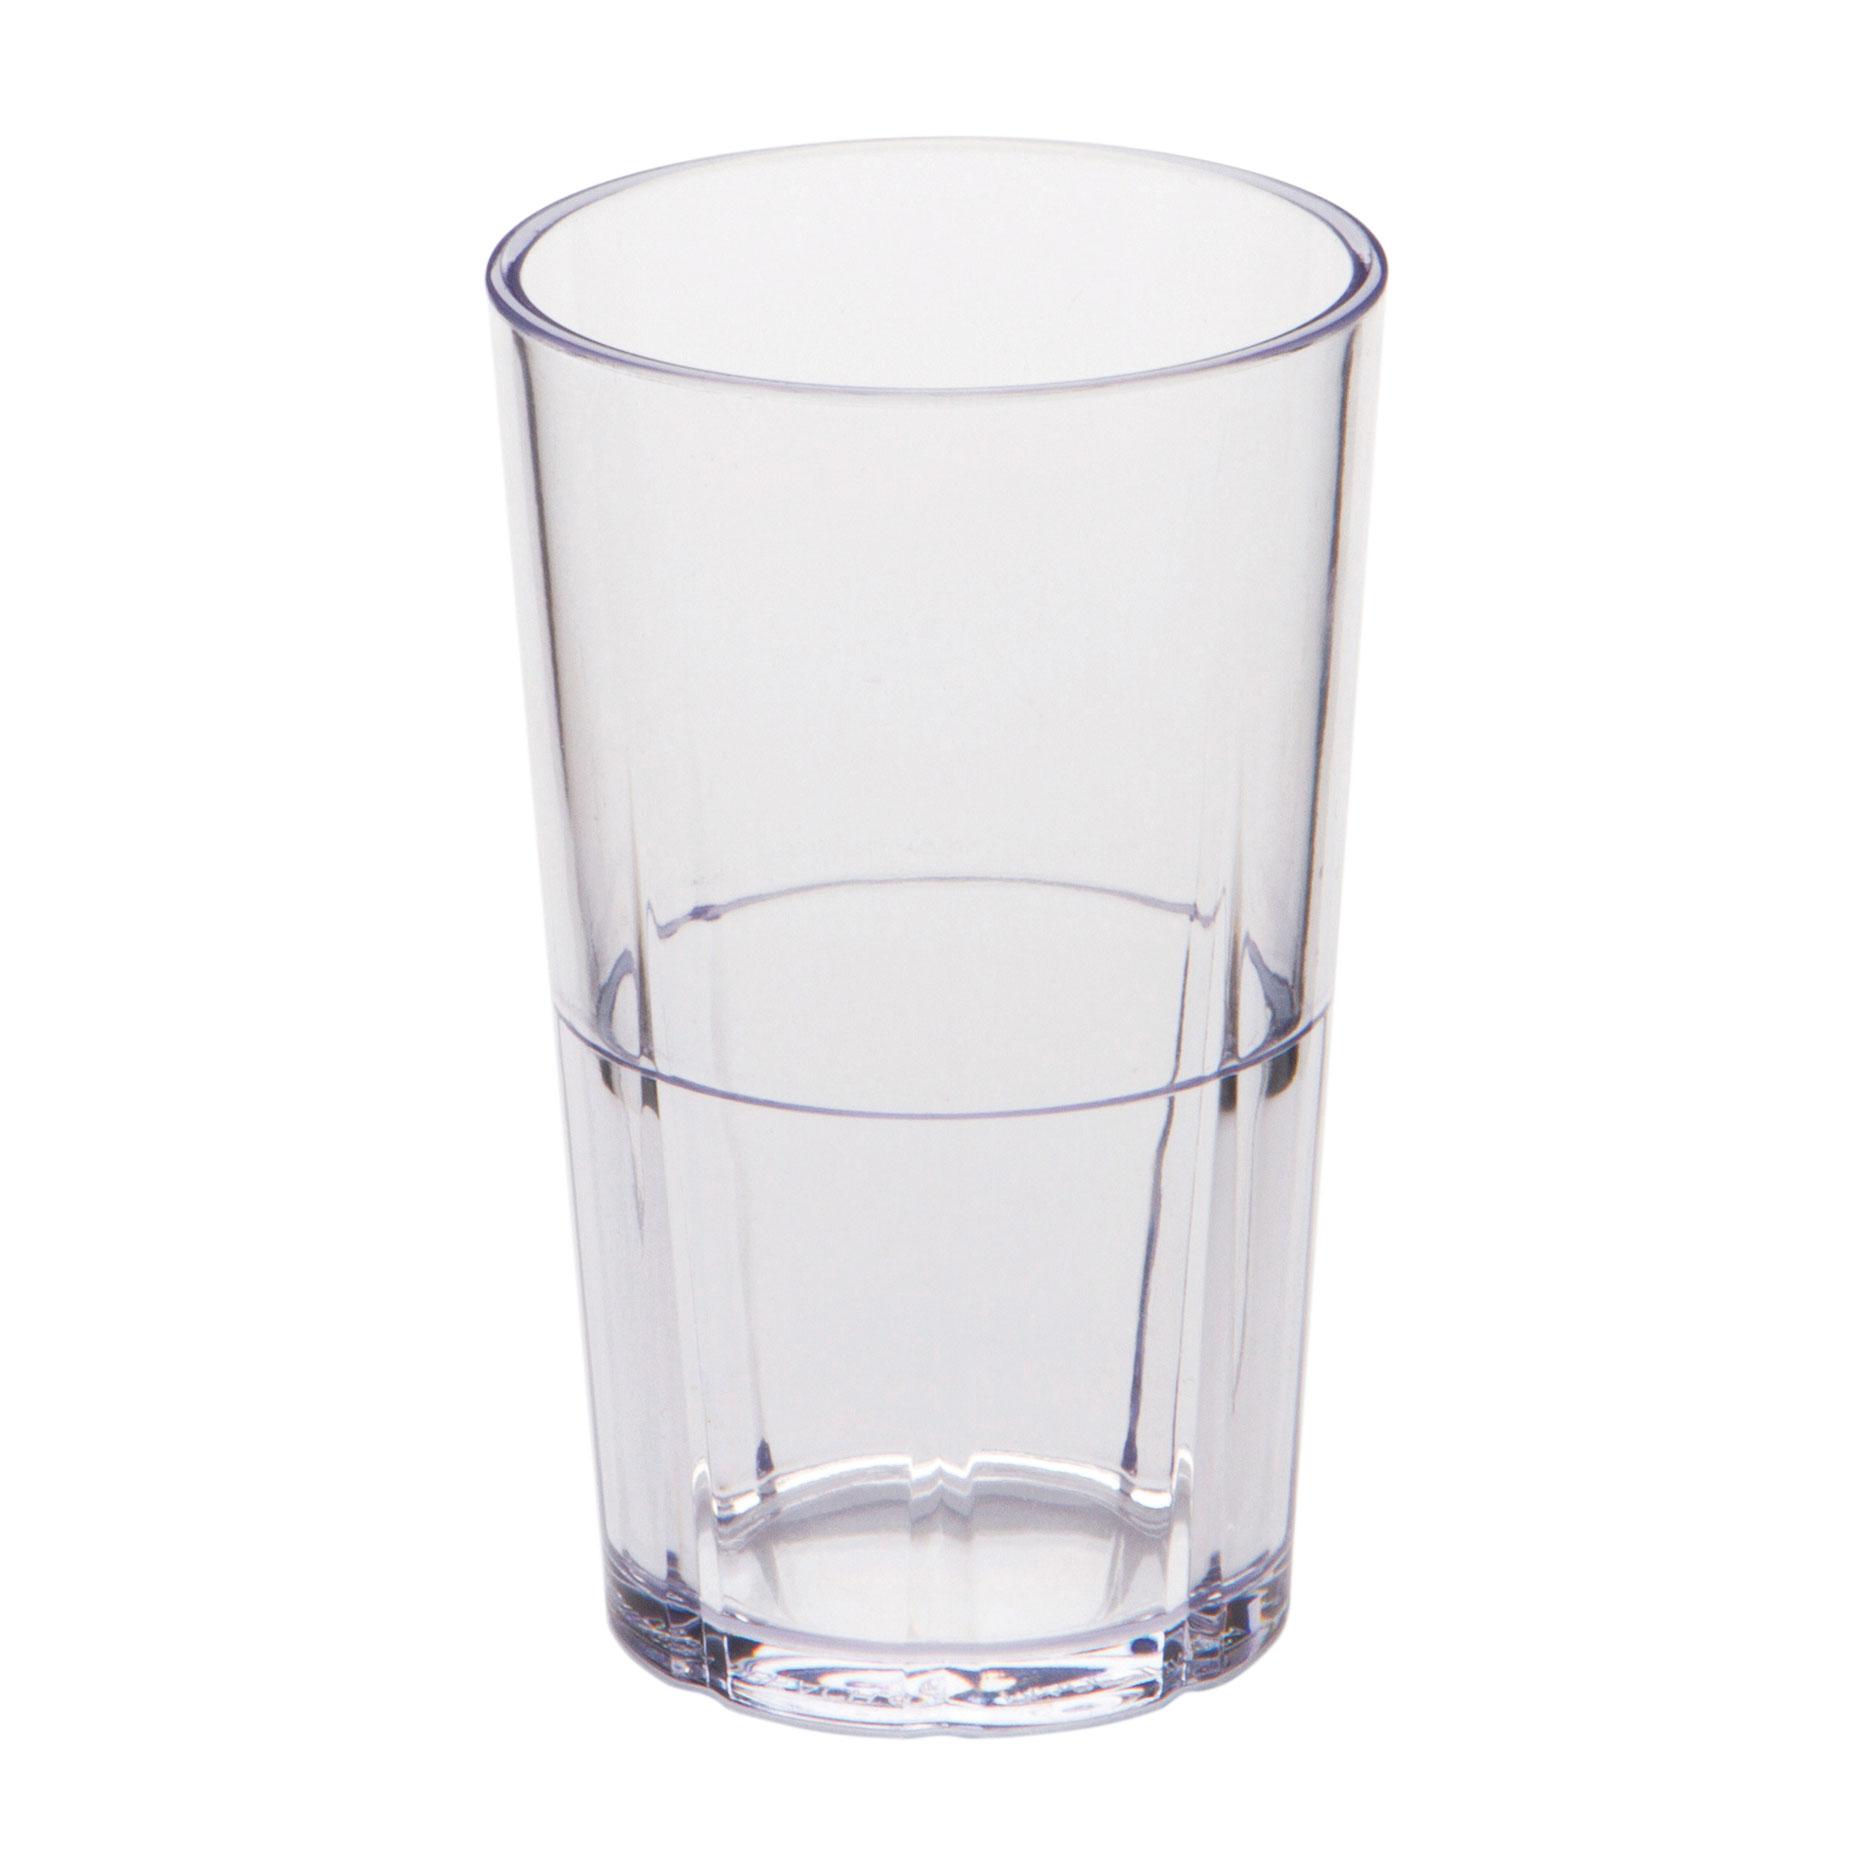 Cambro LDT5152 plastic drinkware